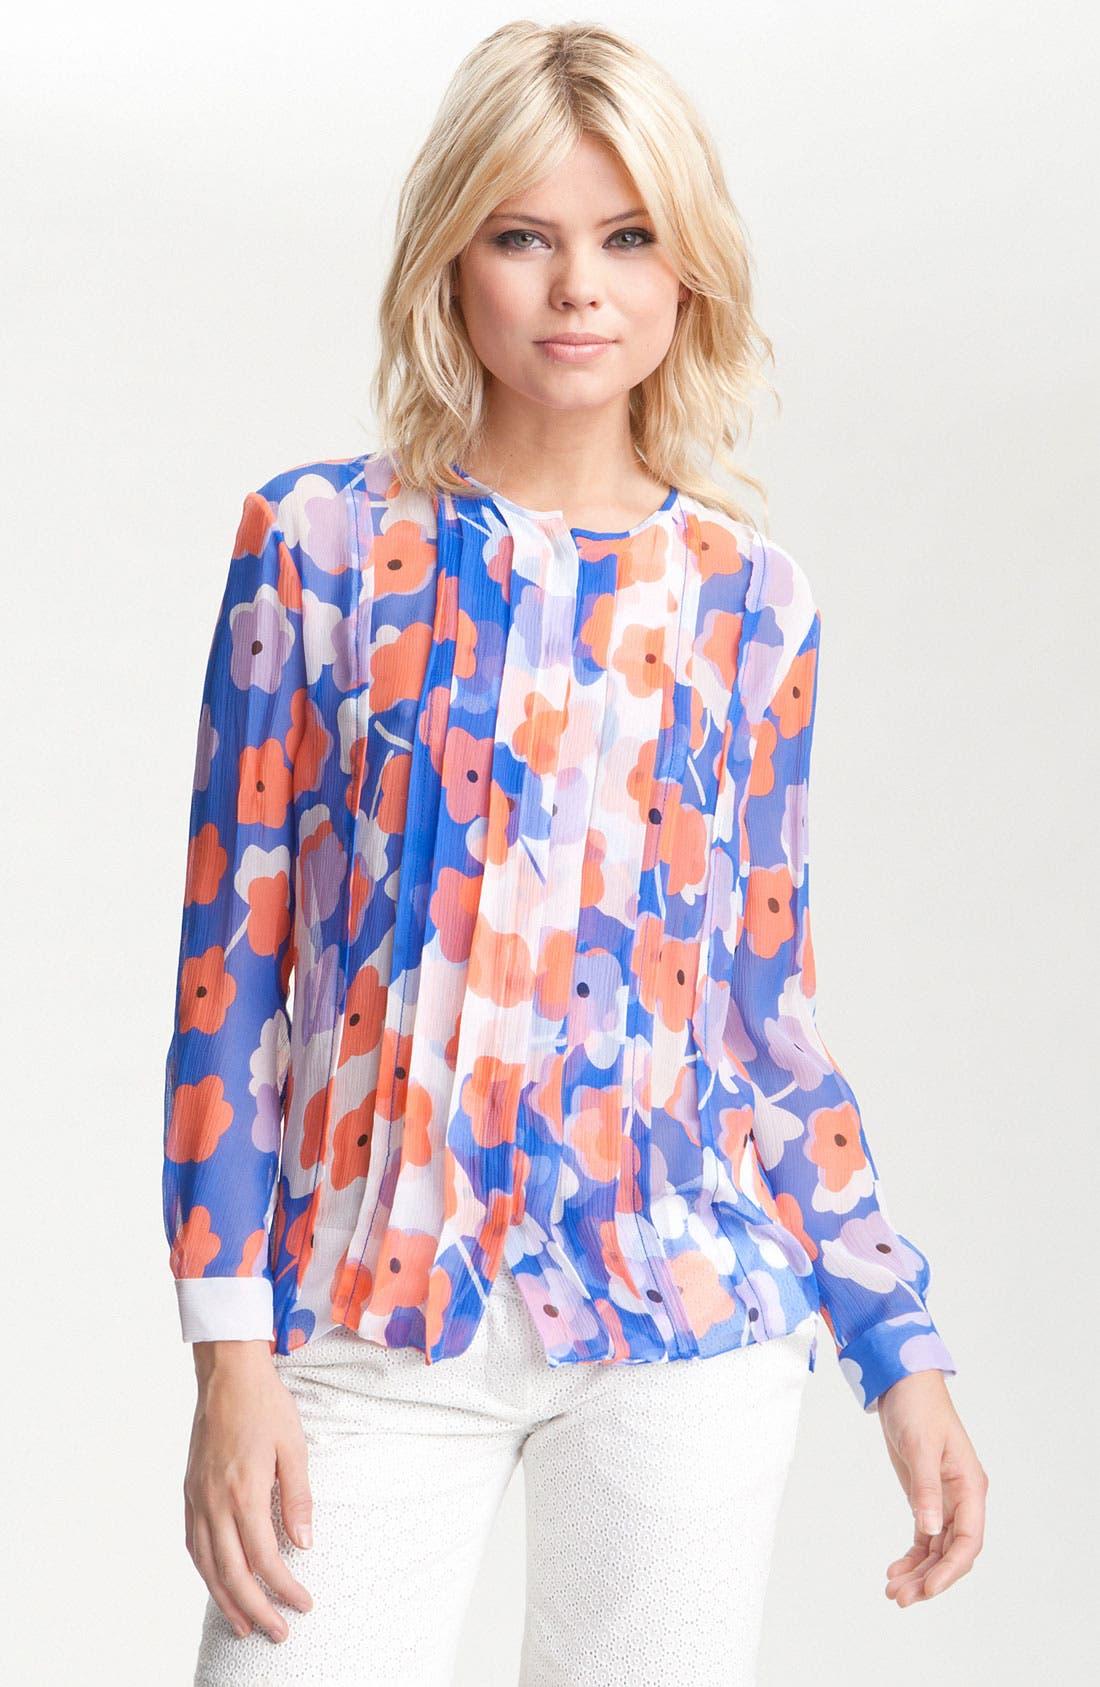 Main Image - Diane von Furstenberg 'Francesca' Sheer Print Silk Blouse